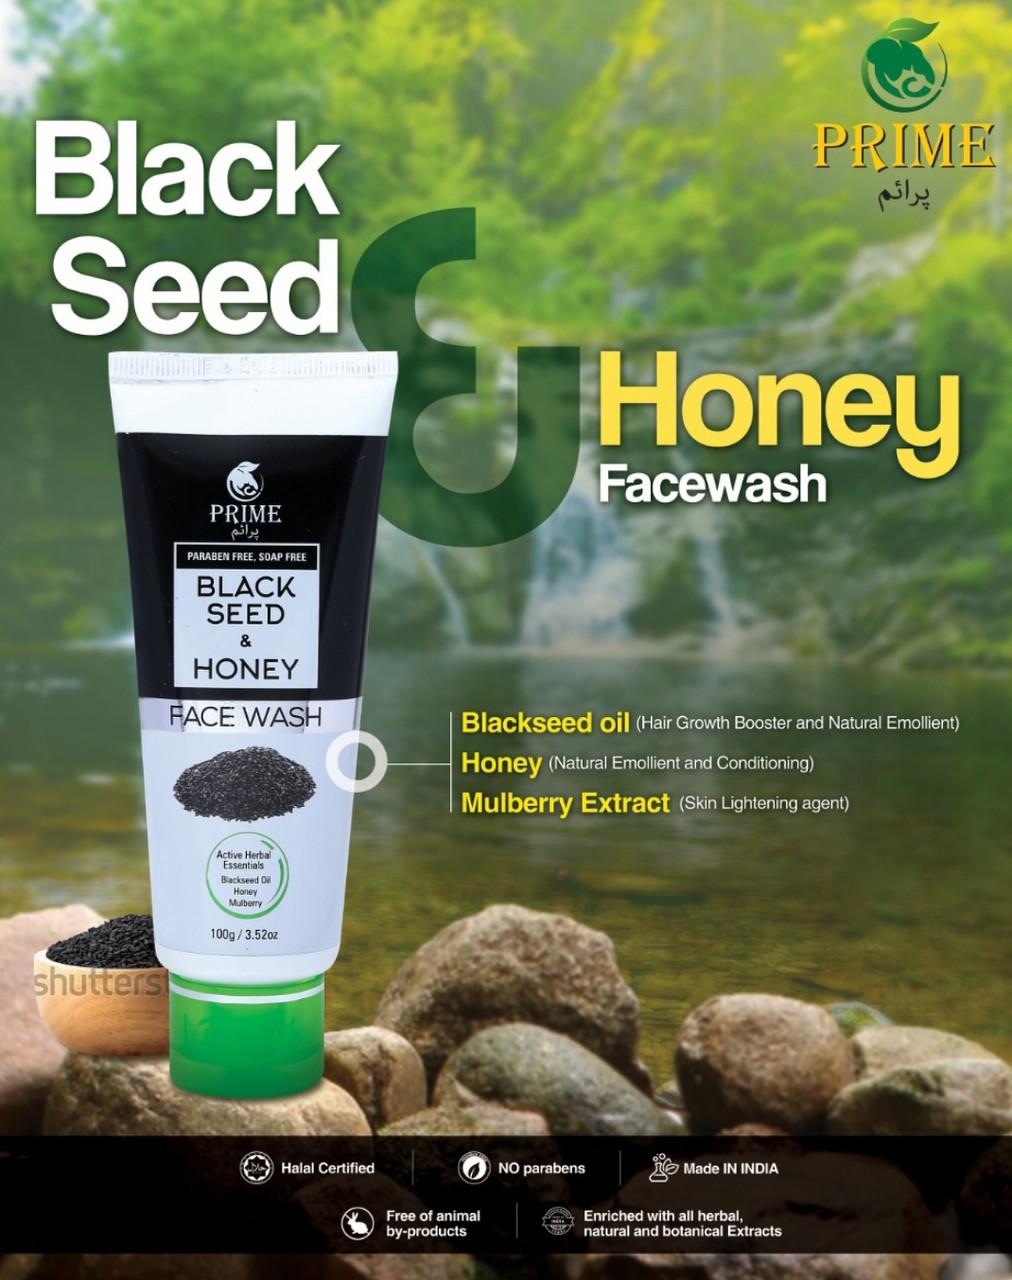 PRIME BLACKSEED AND HONEY FACE WASH средство для умывания лица с медом